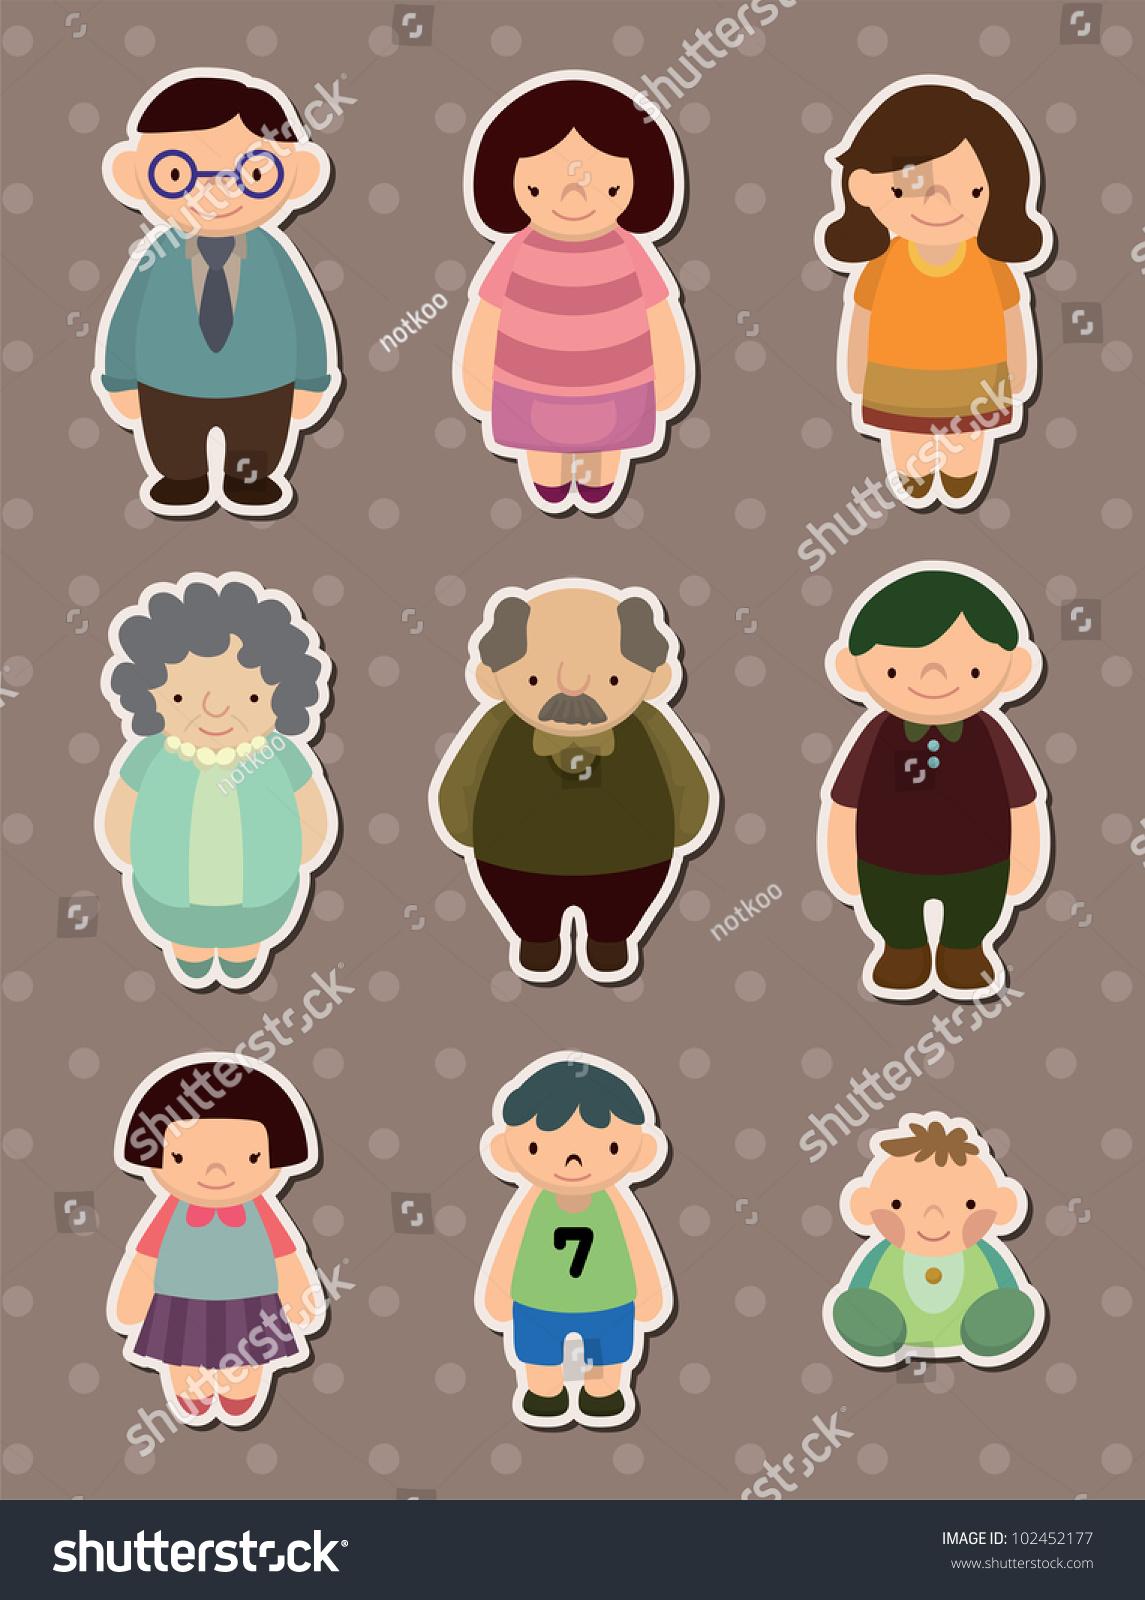 Family Stickers Stock Vector 102452177 - Shutterstock